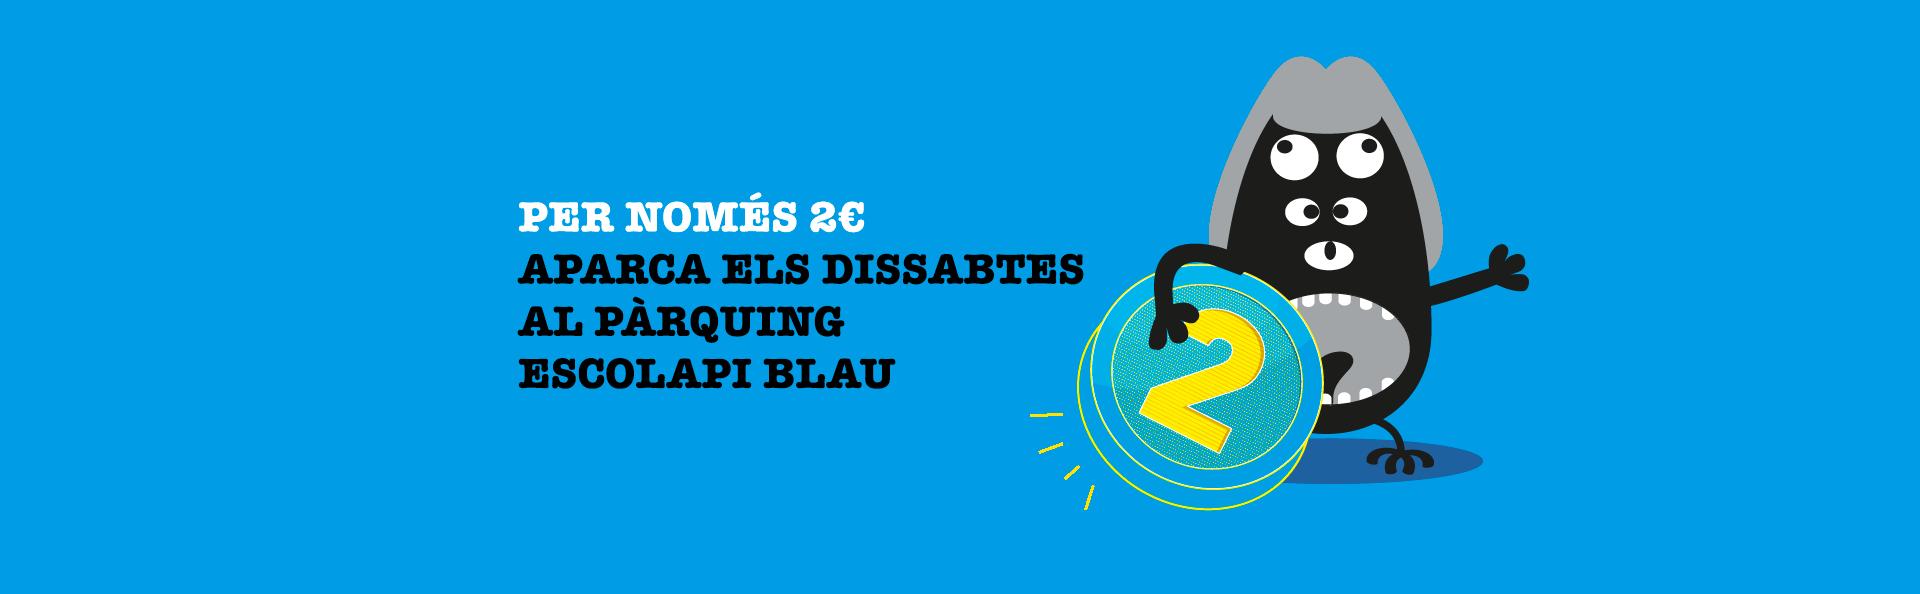 slide-promocio-2-euros-al-parquing-escolapi-blau